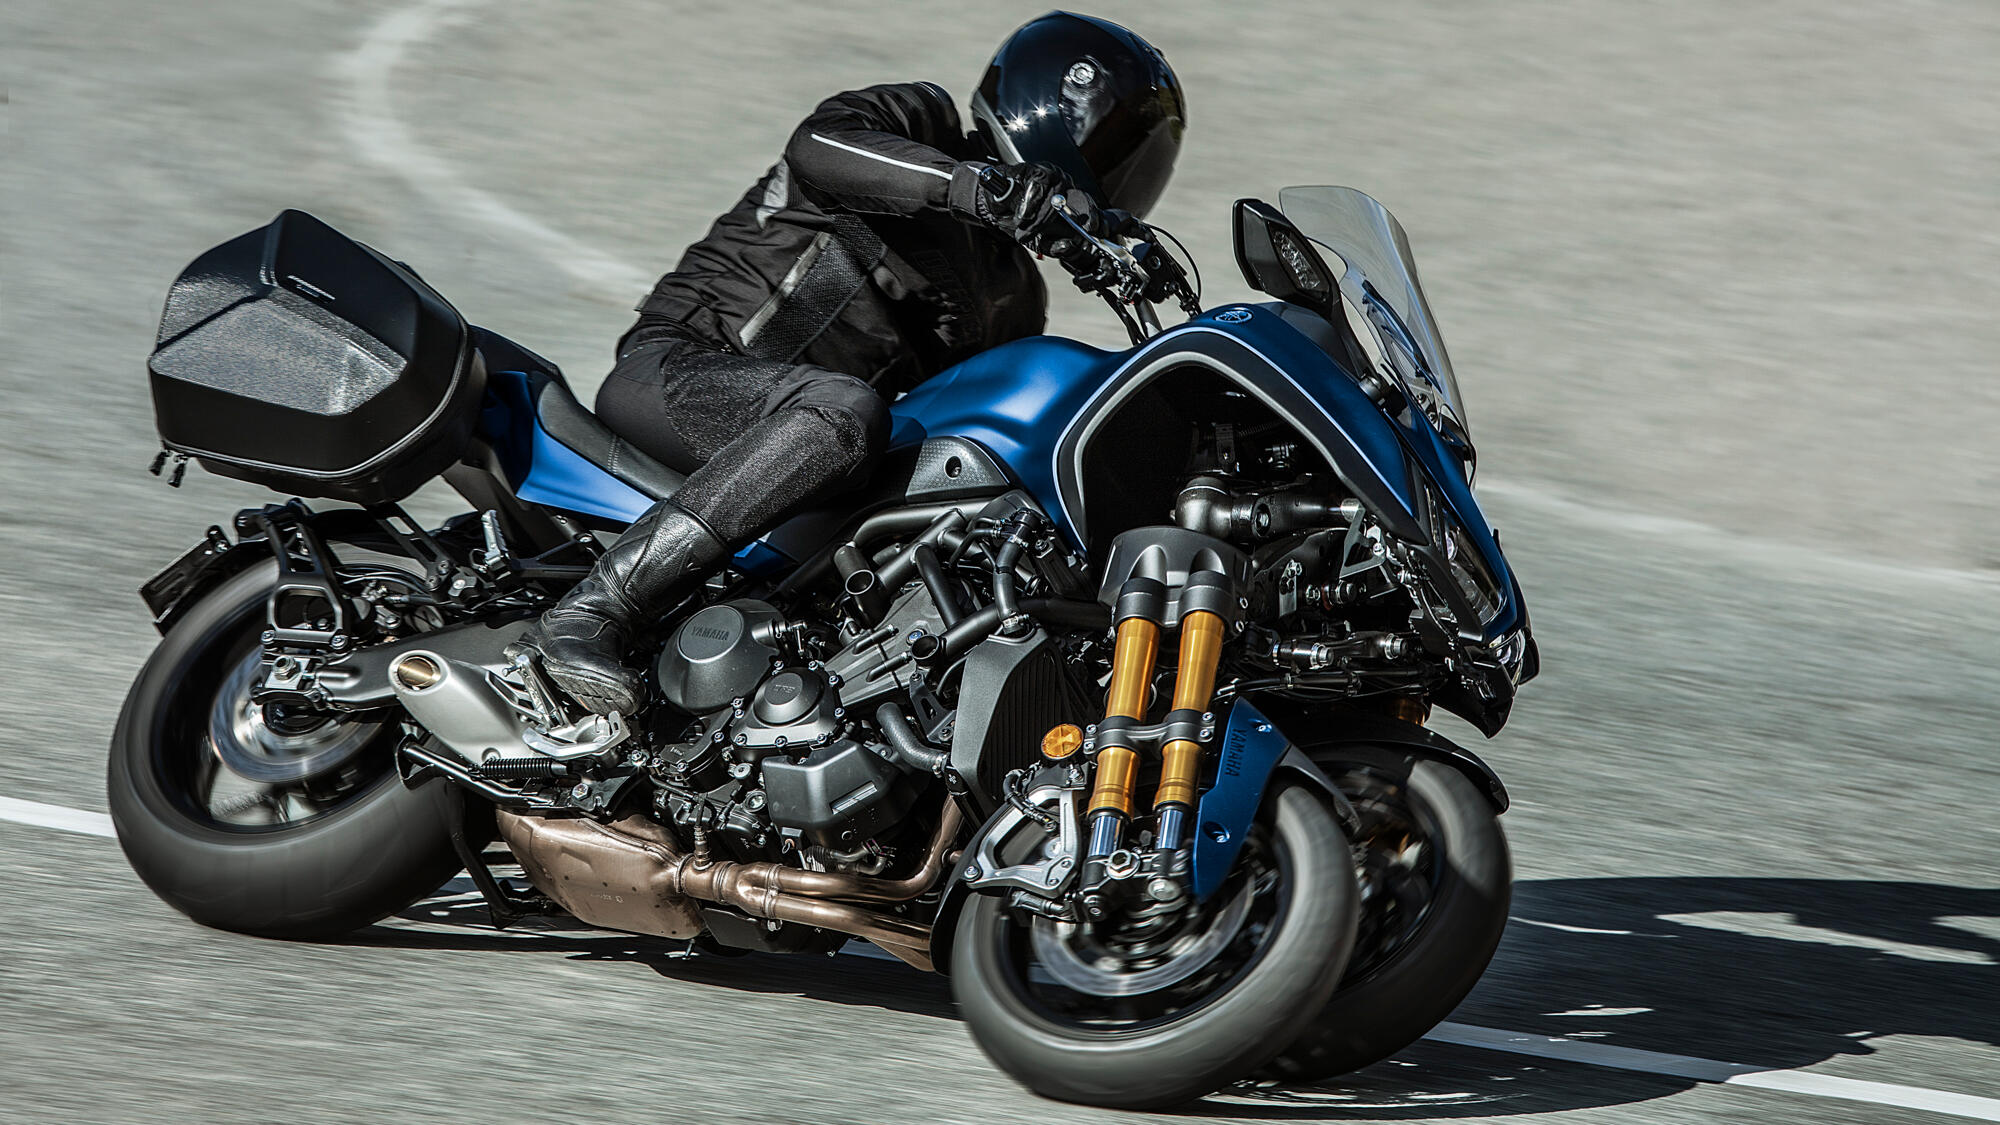 Niken Gt Motorcycles Yamaha Motor